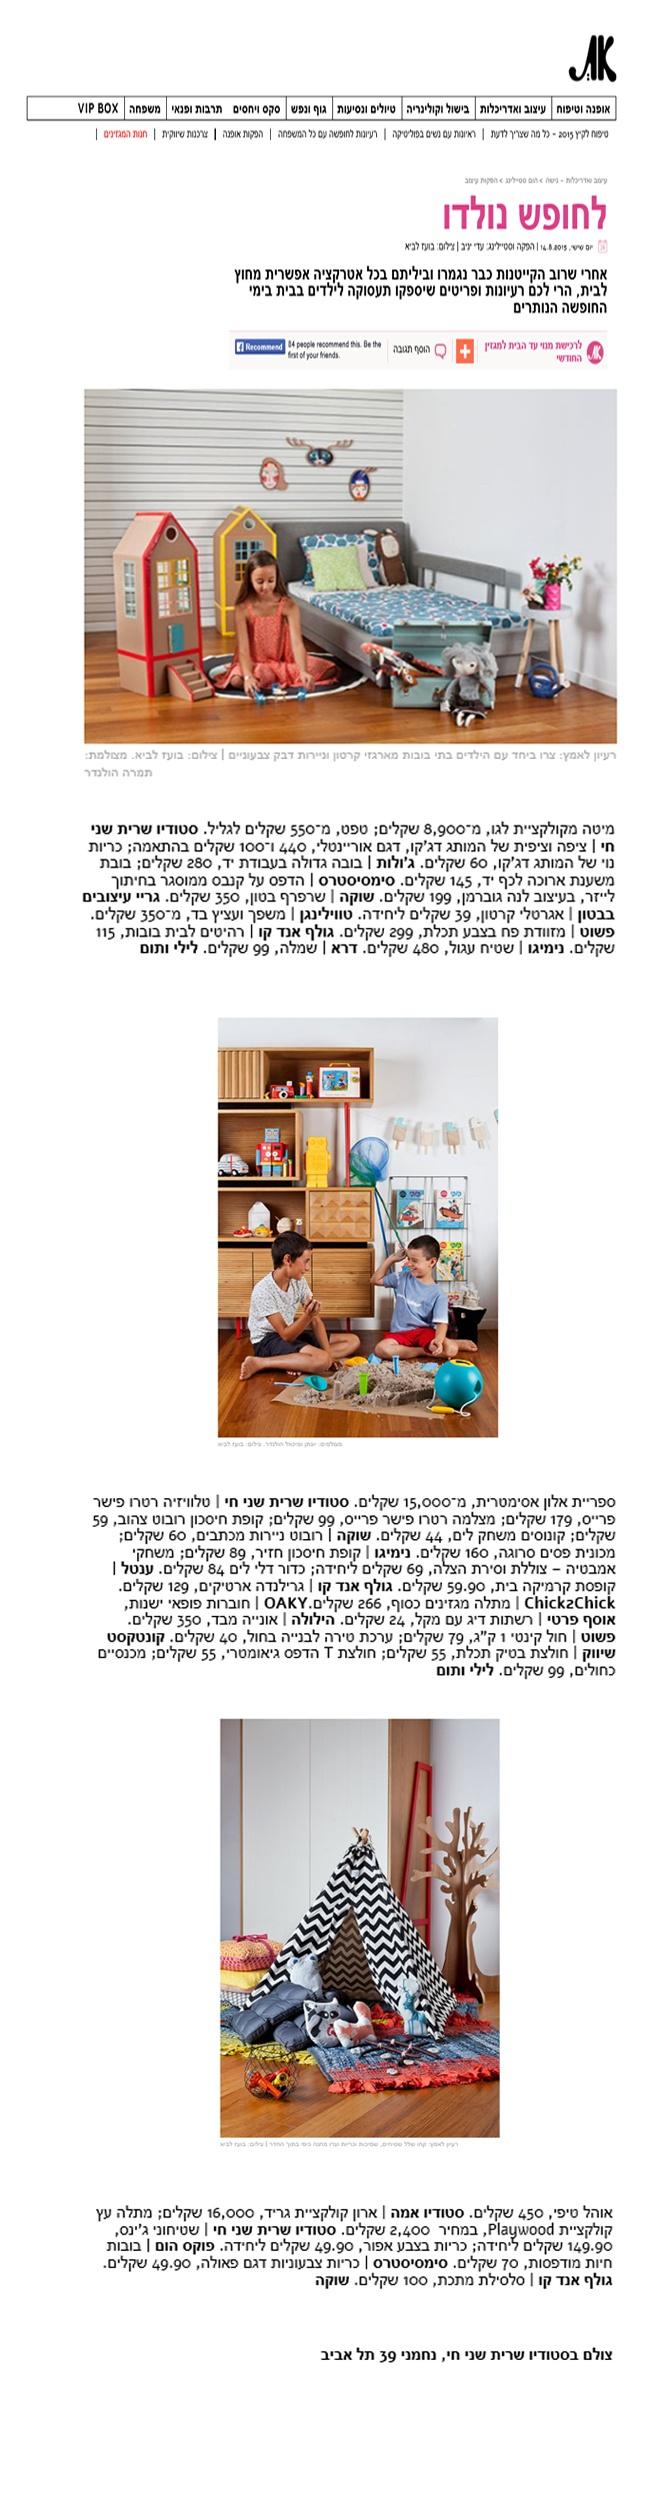 Niche Magazine - You